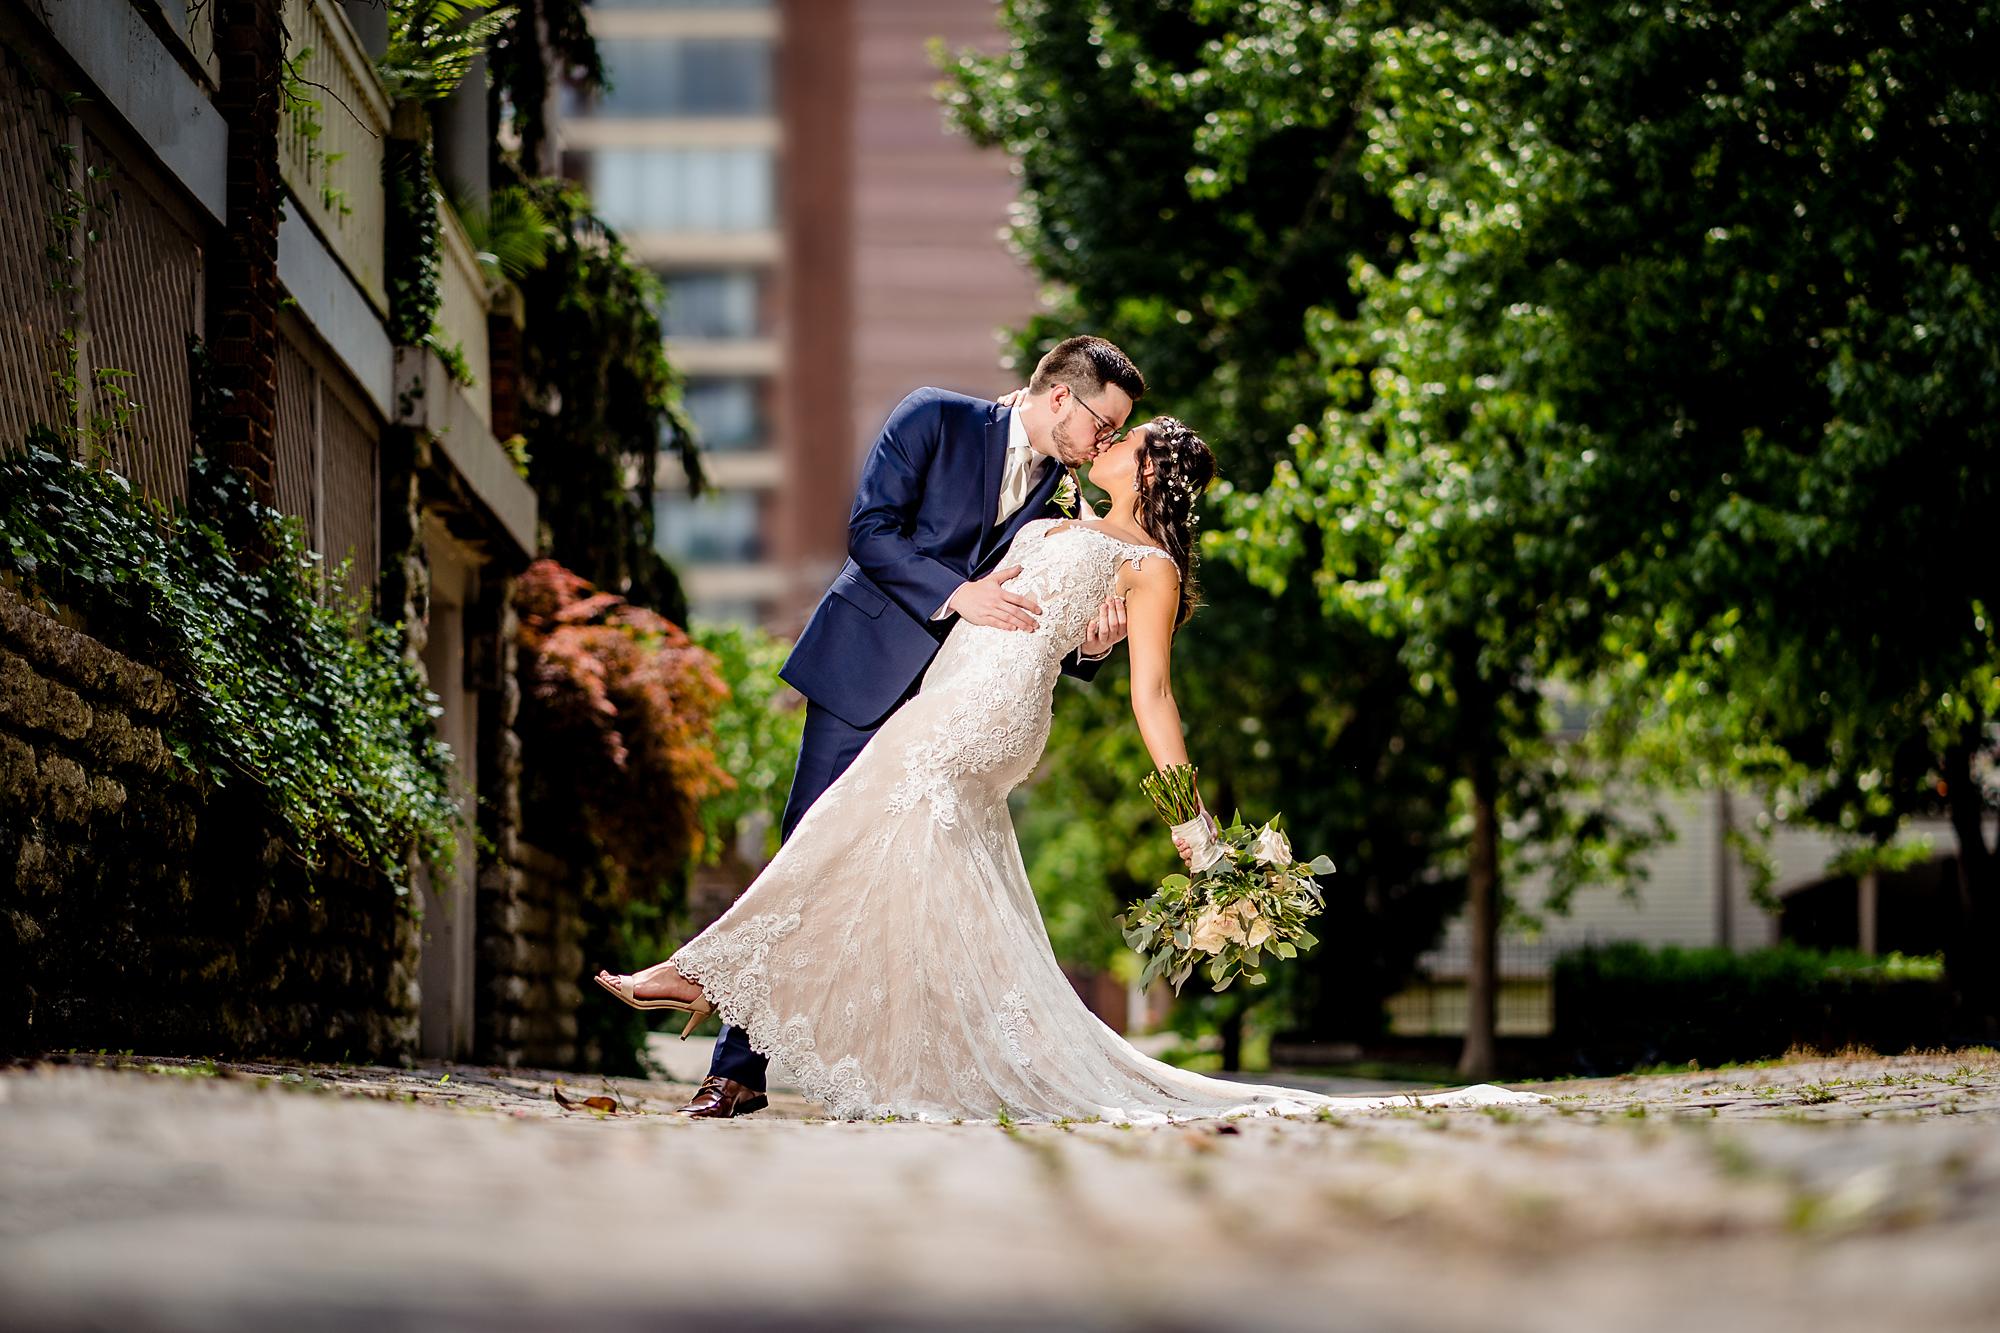 Embassy-Suites-Rivercenter-Wedding-Photography.jpg